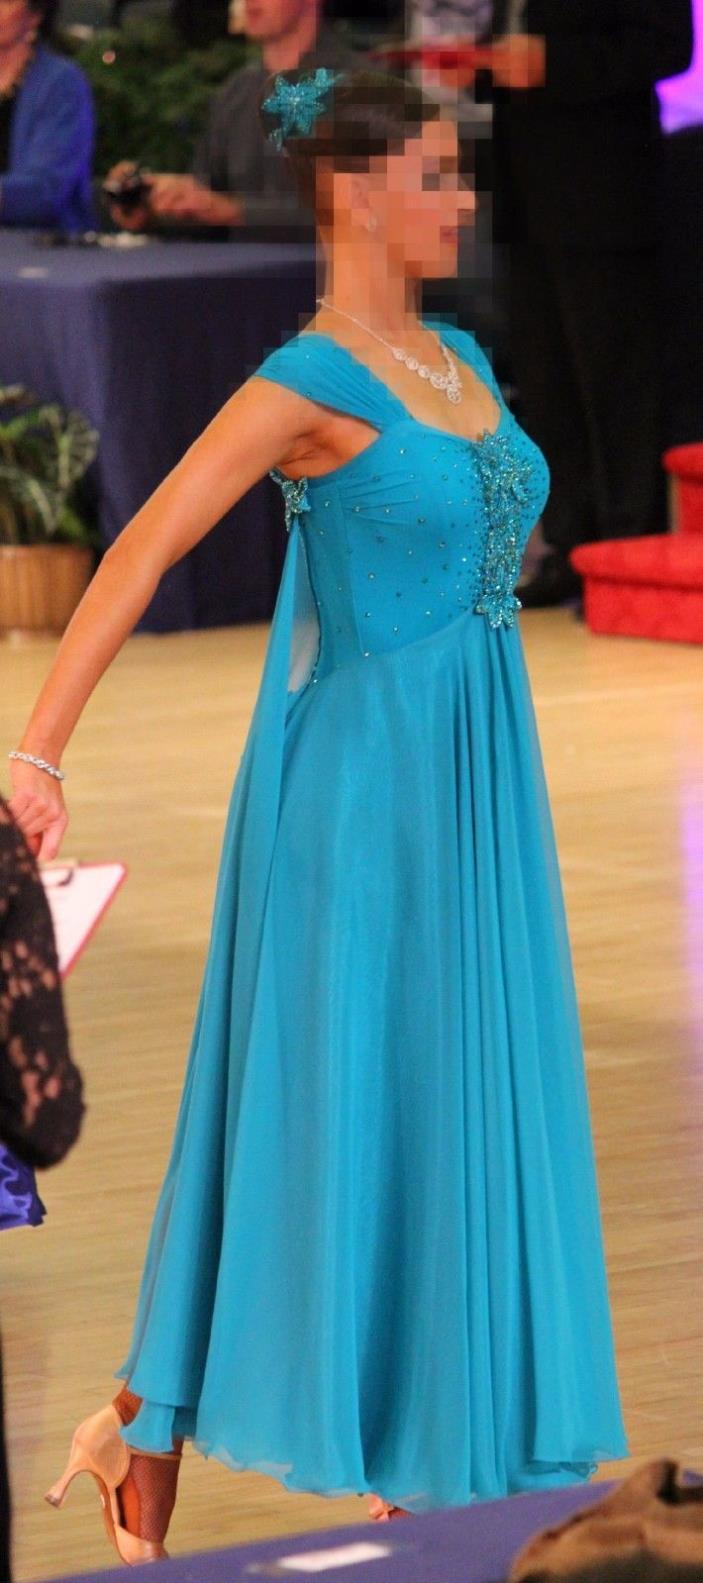 Turquoise Ballroom Dance Dress